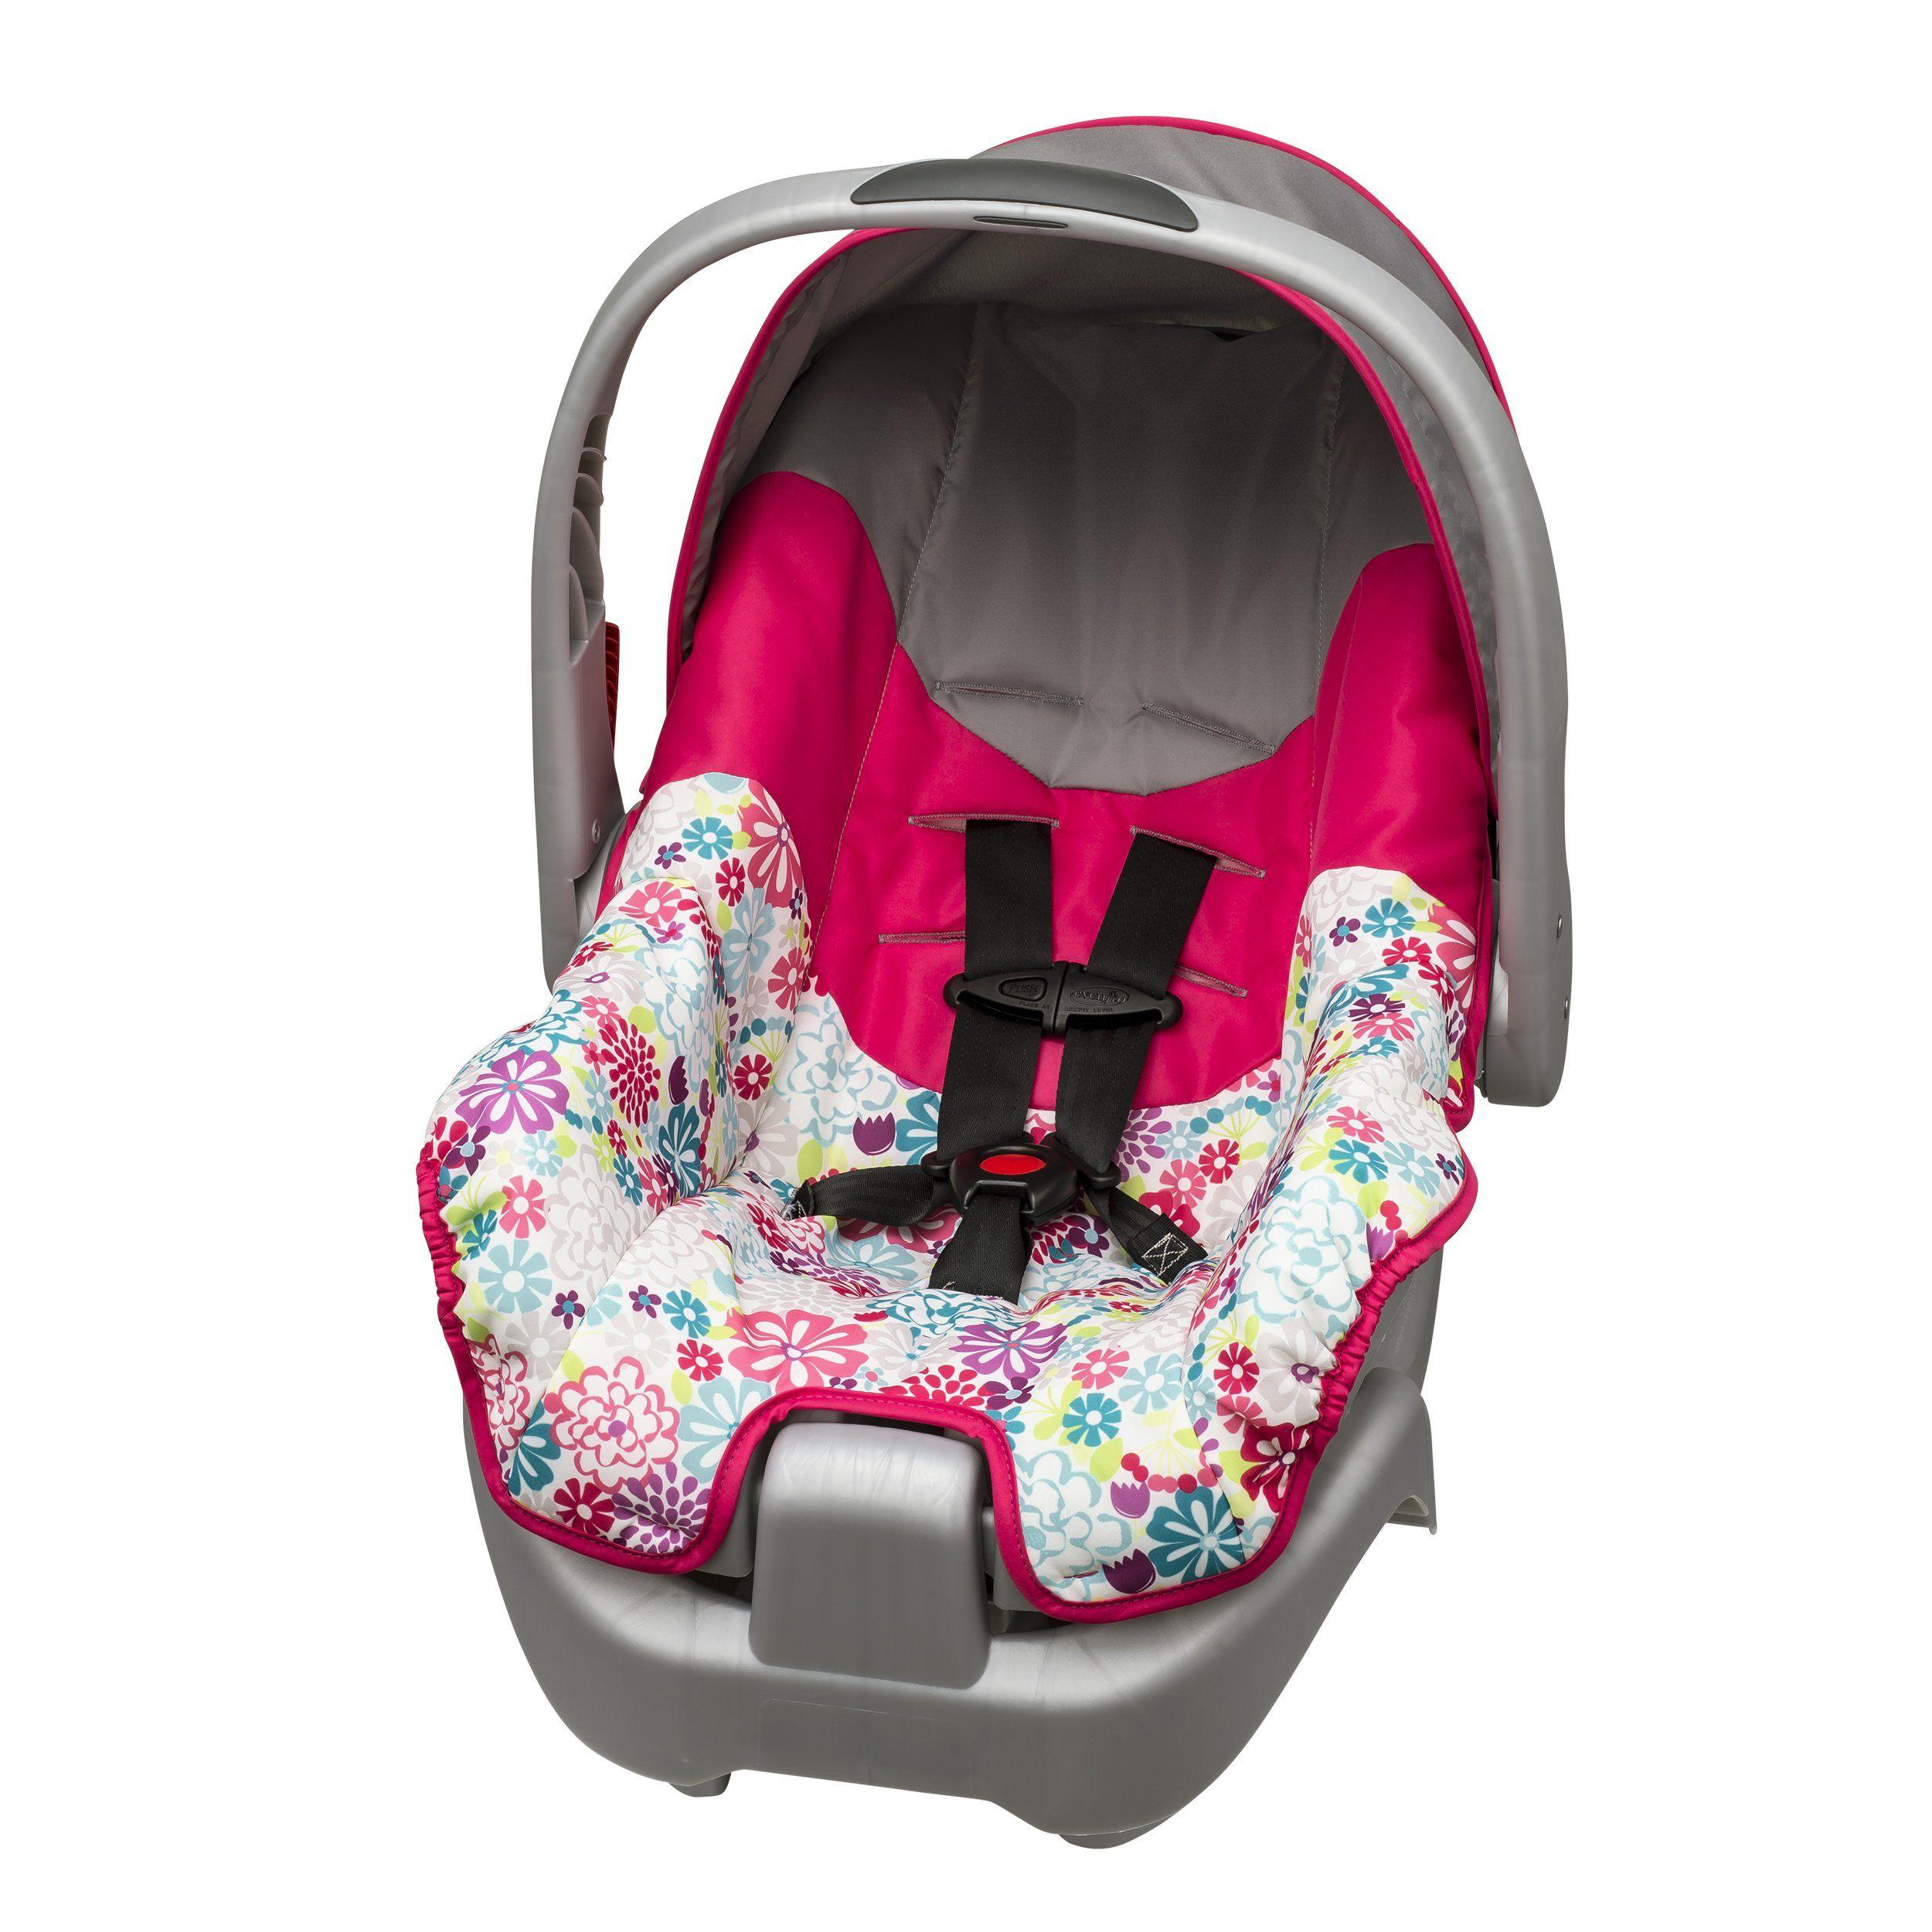 Evenflo Nurture Infant Car Seat Sabrina * Click image to